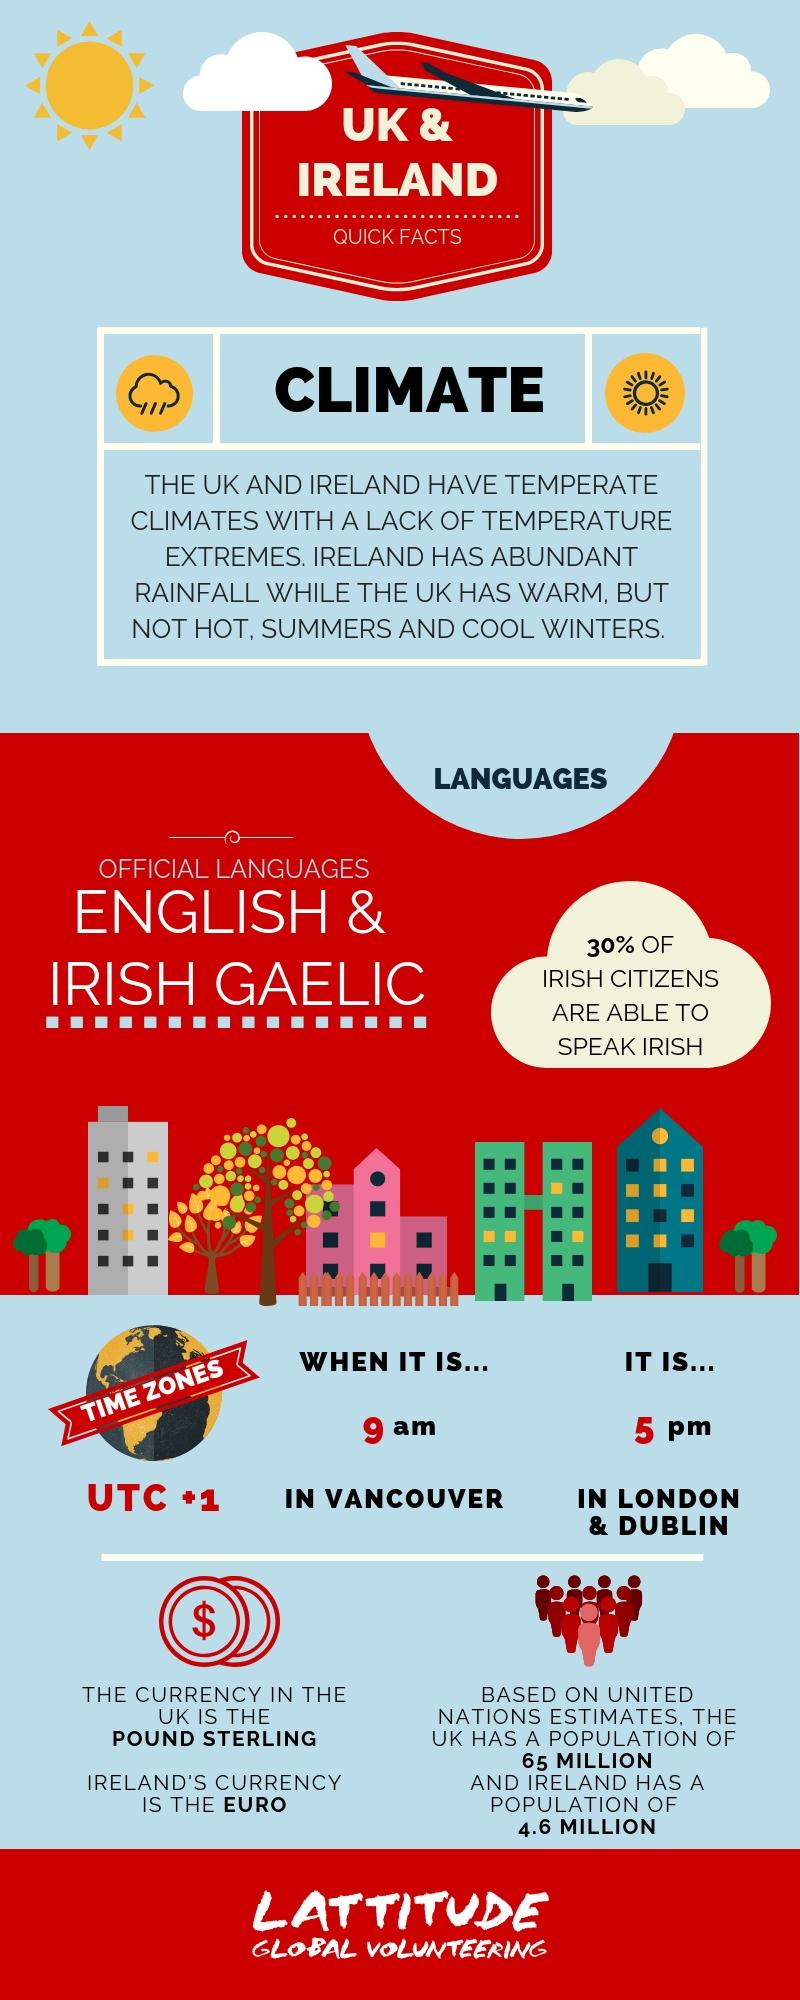 UK & Ireland Quick Facts.jpg